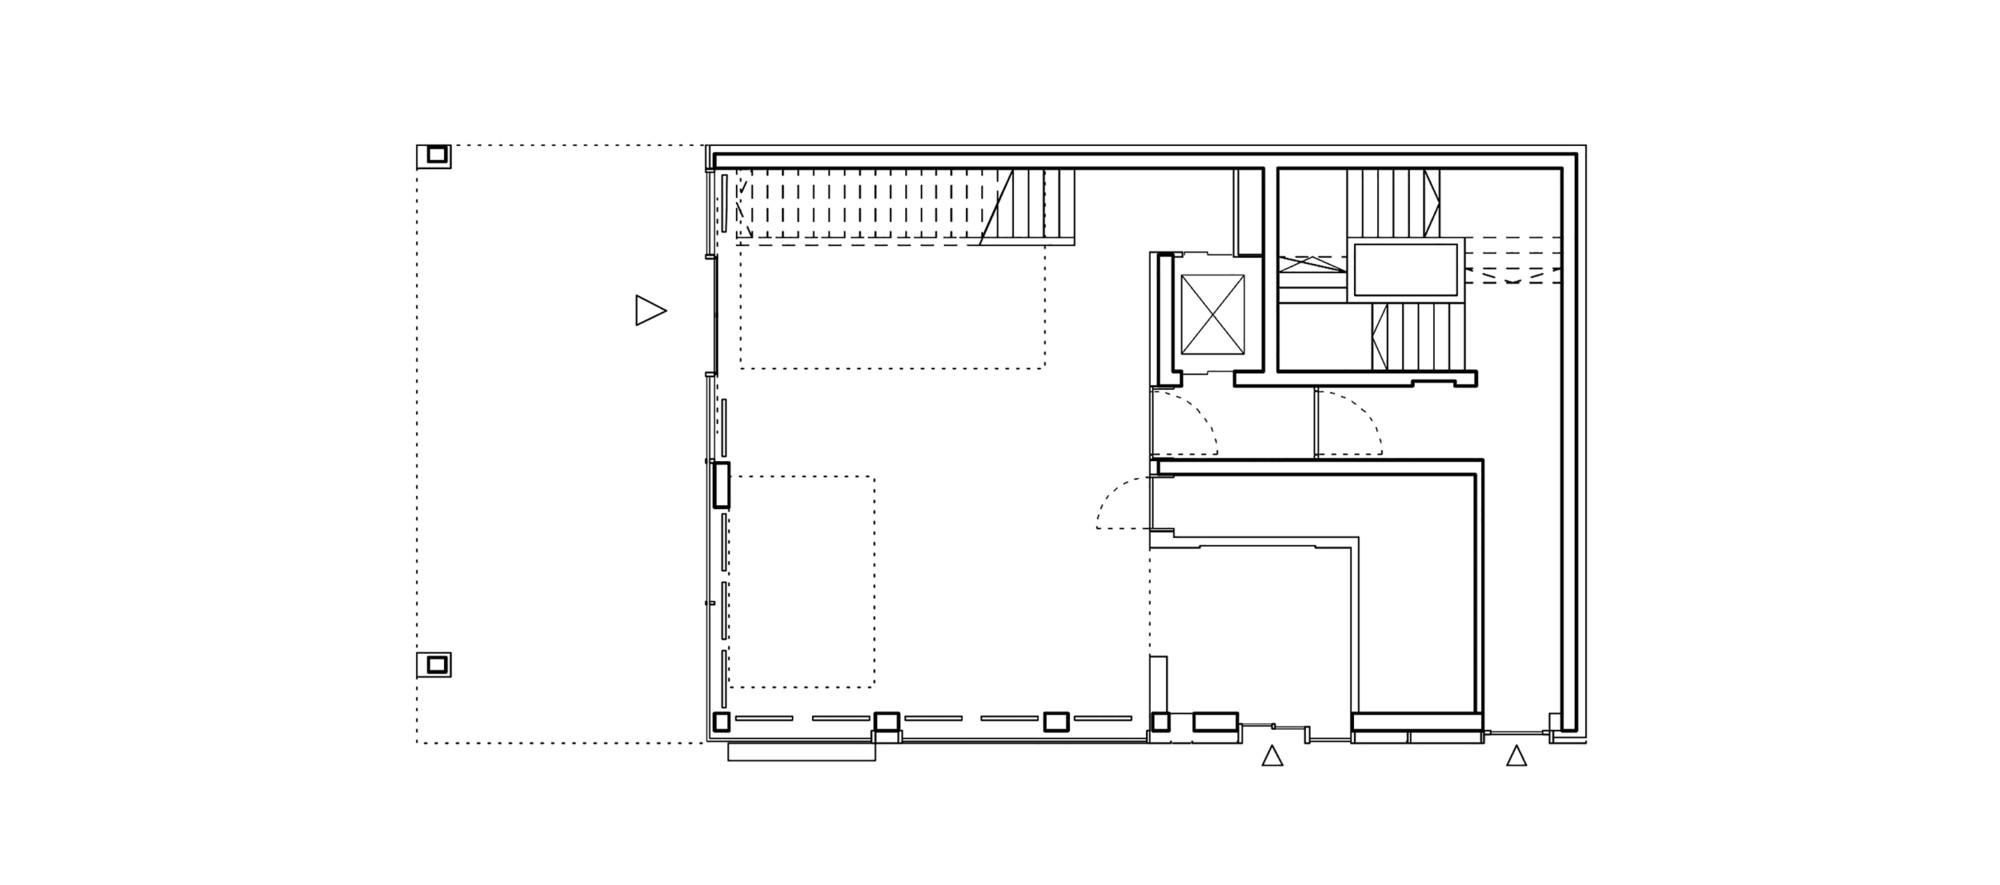 Gallery Of Psd Bank Office Building Bayer Strobel Architekten 16